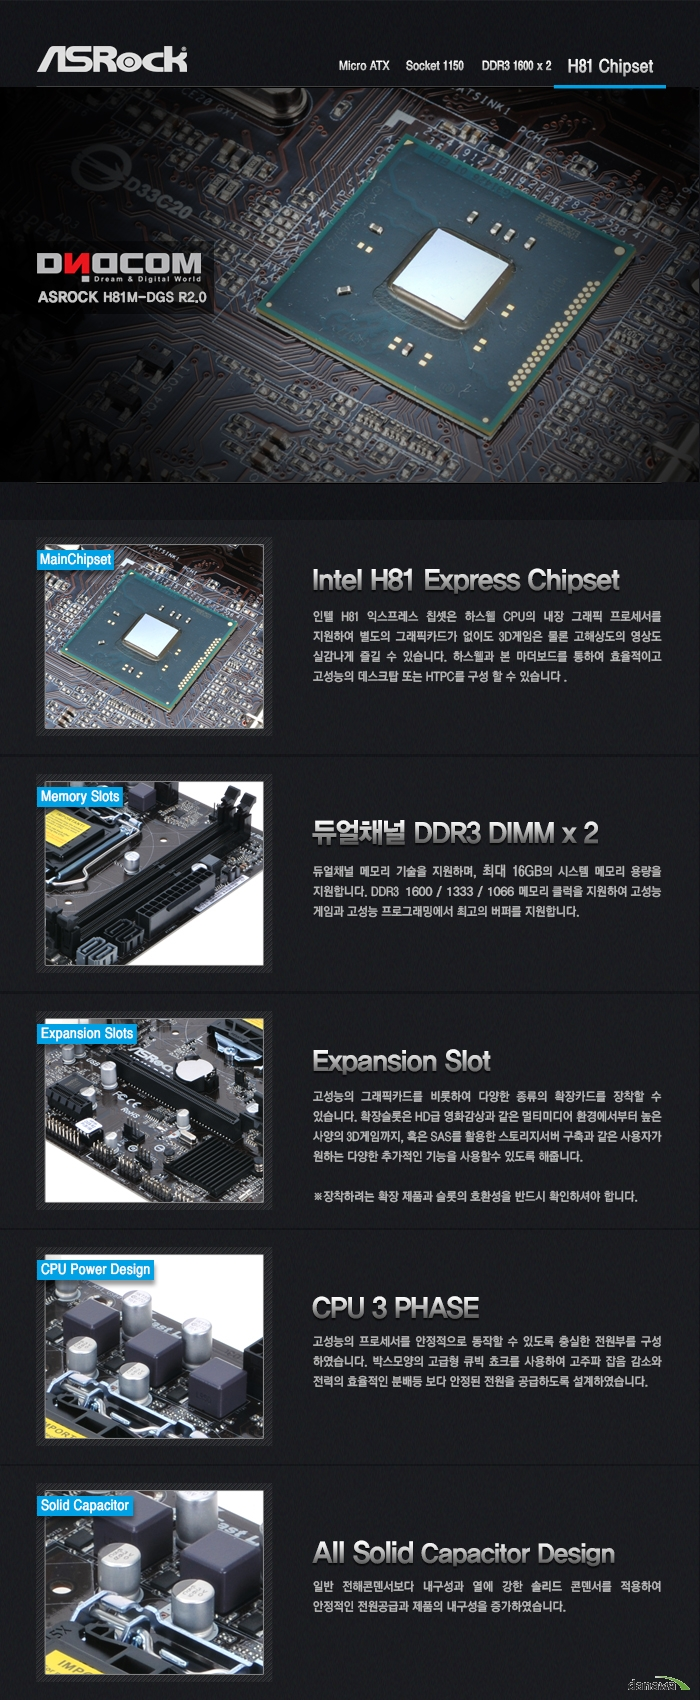 ASRock H81M-DGS R2.0 제품 메인 칩셋, DIMM, 확장슬롯, 전원부 확대 이미지 및 설명